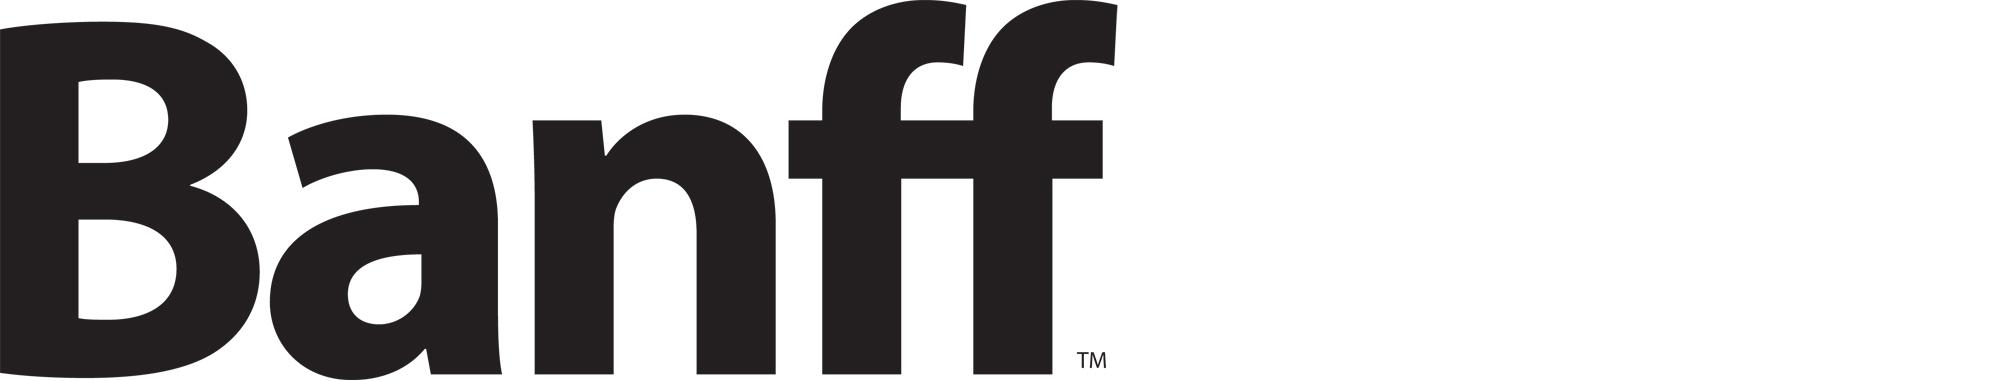 banff-logo-banner.jpg